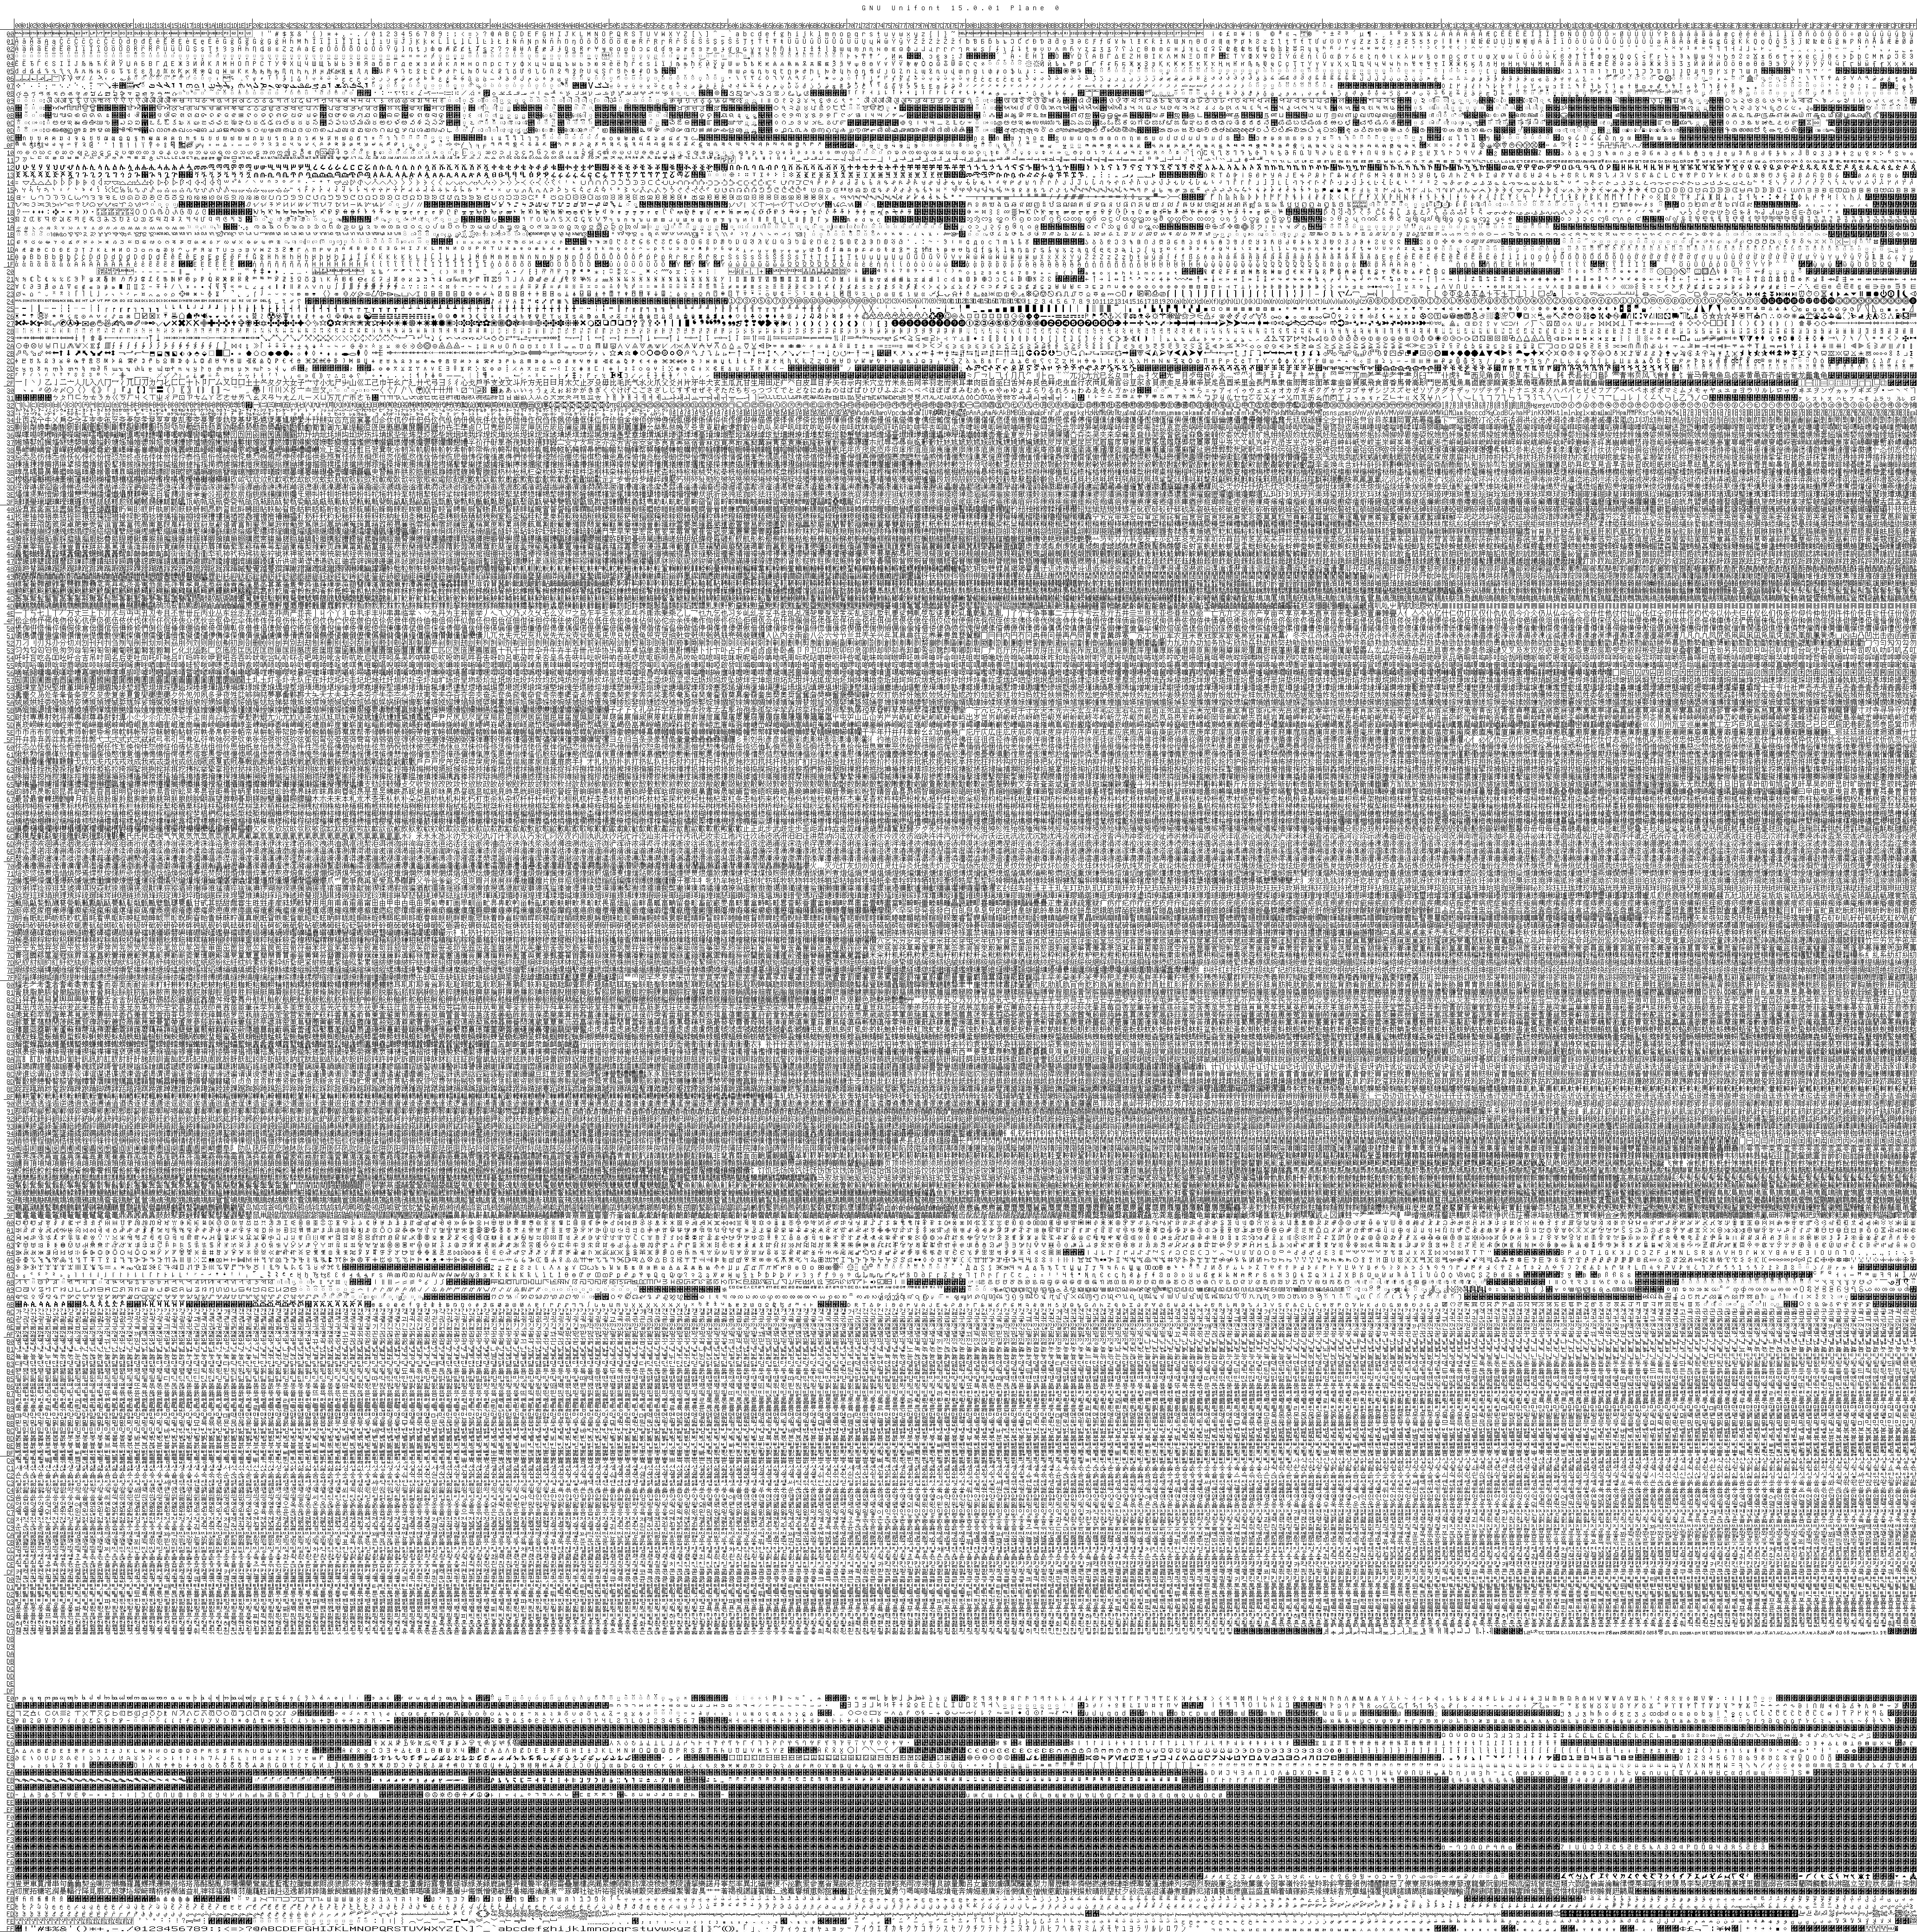 lonstone bináris opció)